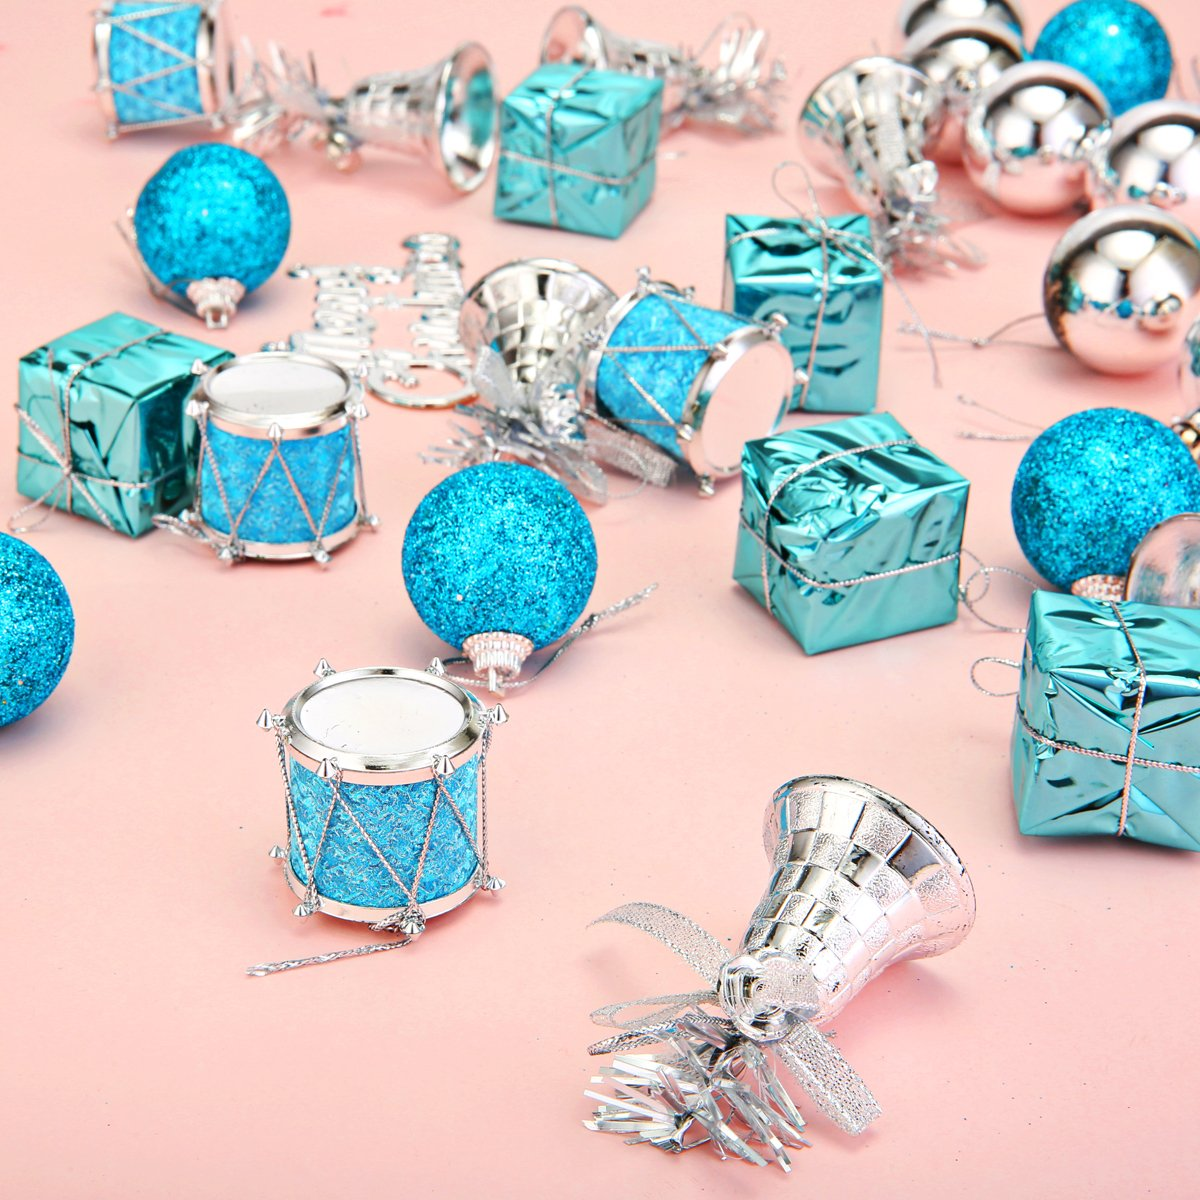 Amazon.com: Jeteven 32pcs Christmas Ornaments Set Hanging Decoration ...